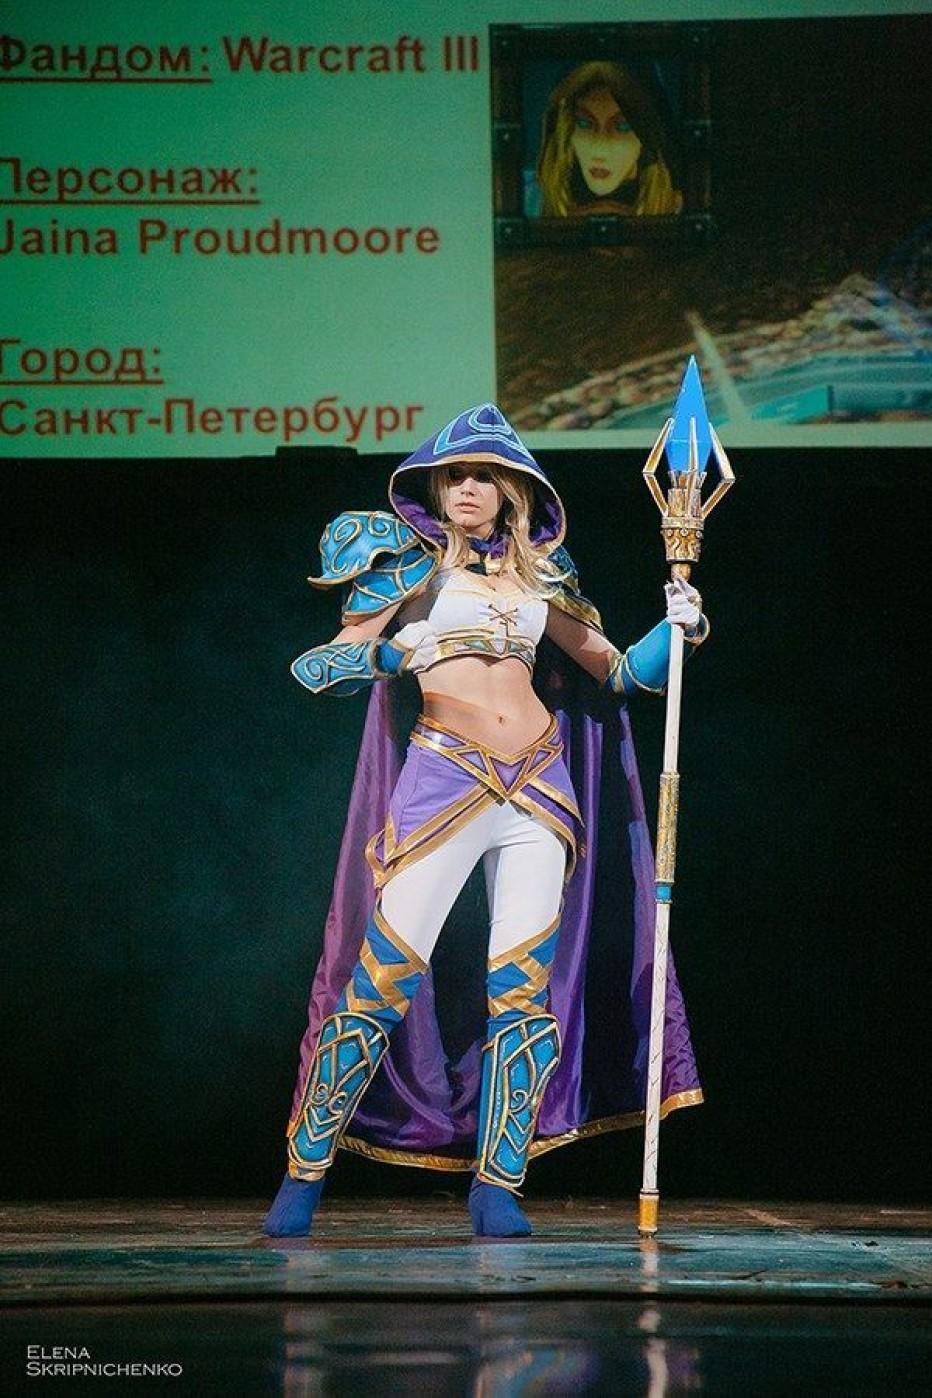 Warcraft-III-Jaina-Proudmoore-Narga-Cosplay-Gamers-Heroes-7.jpg